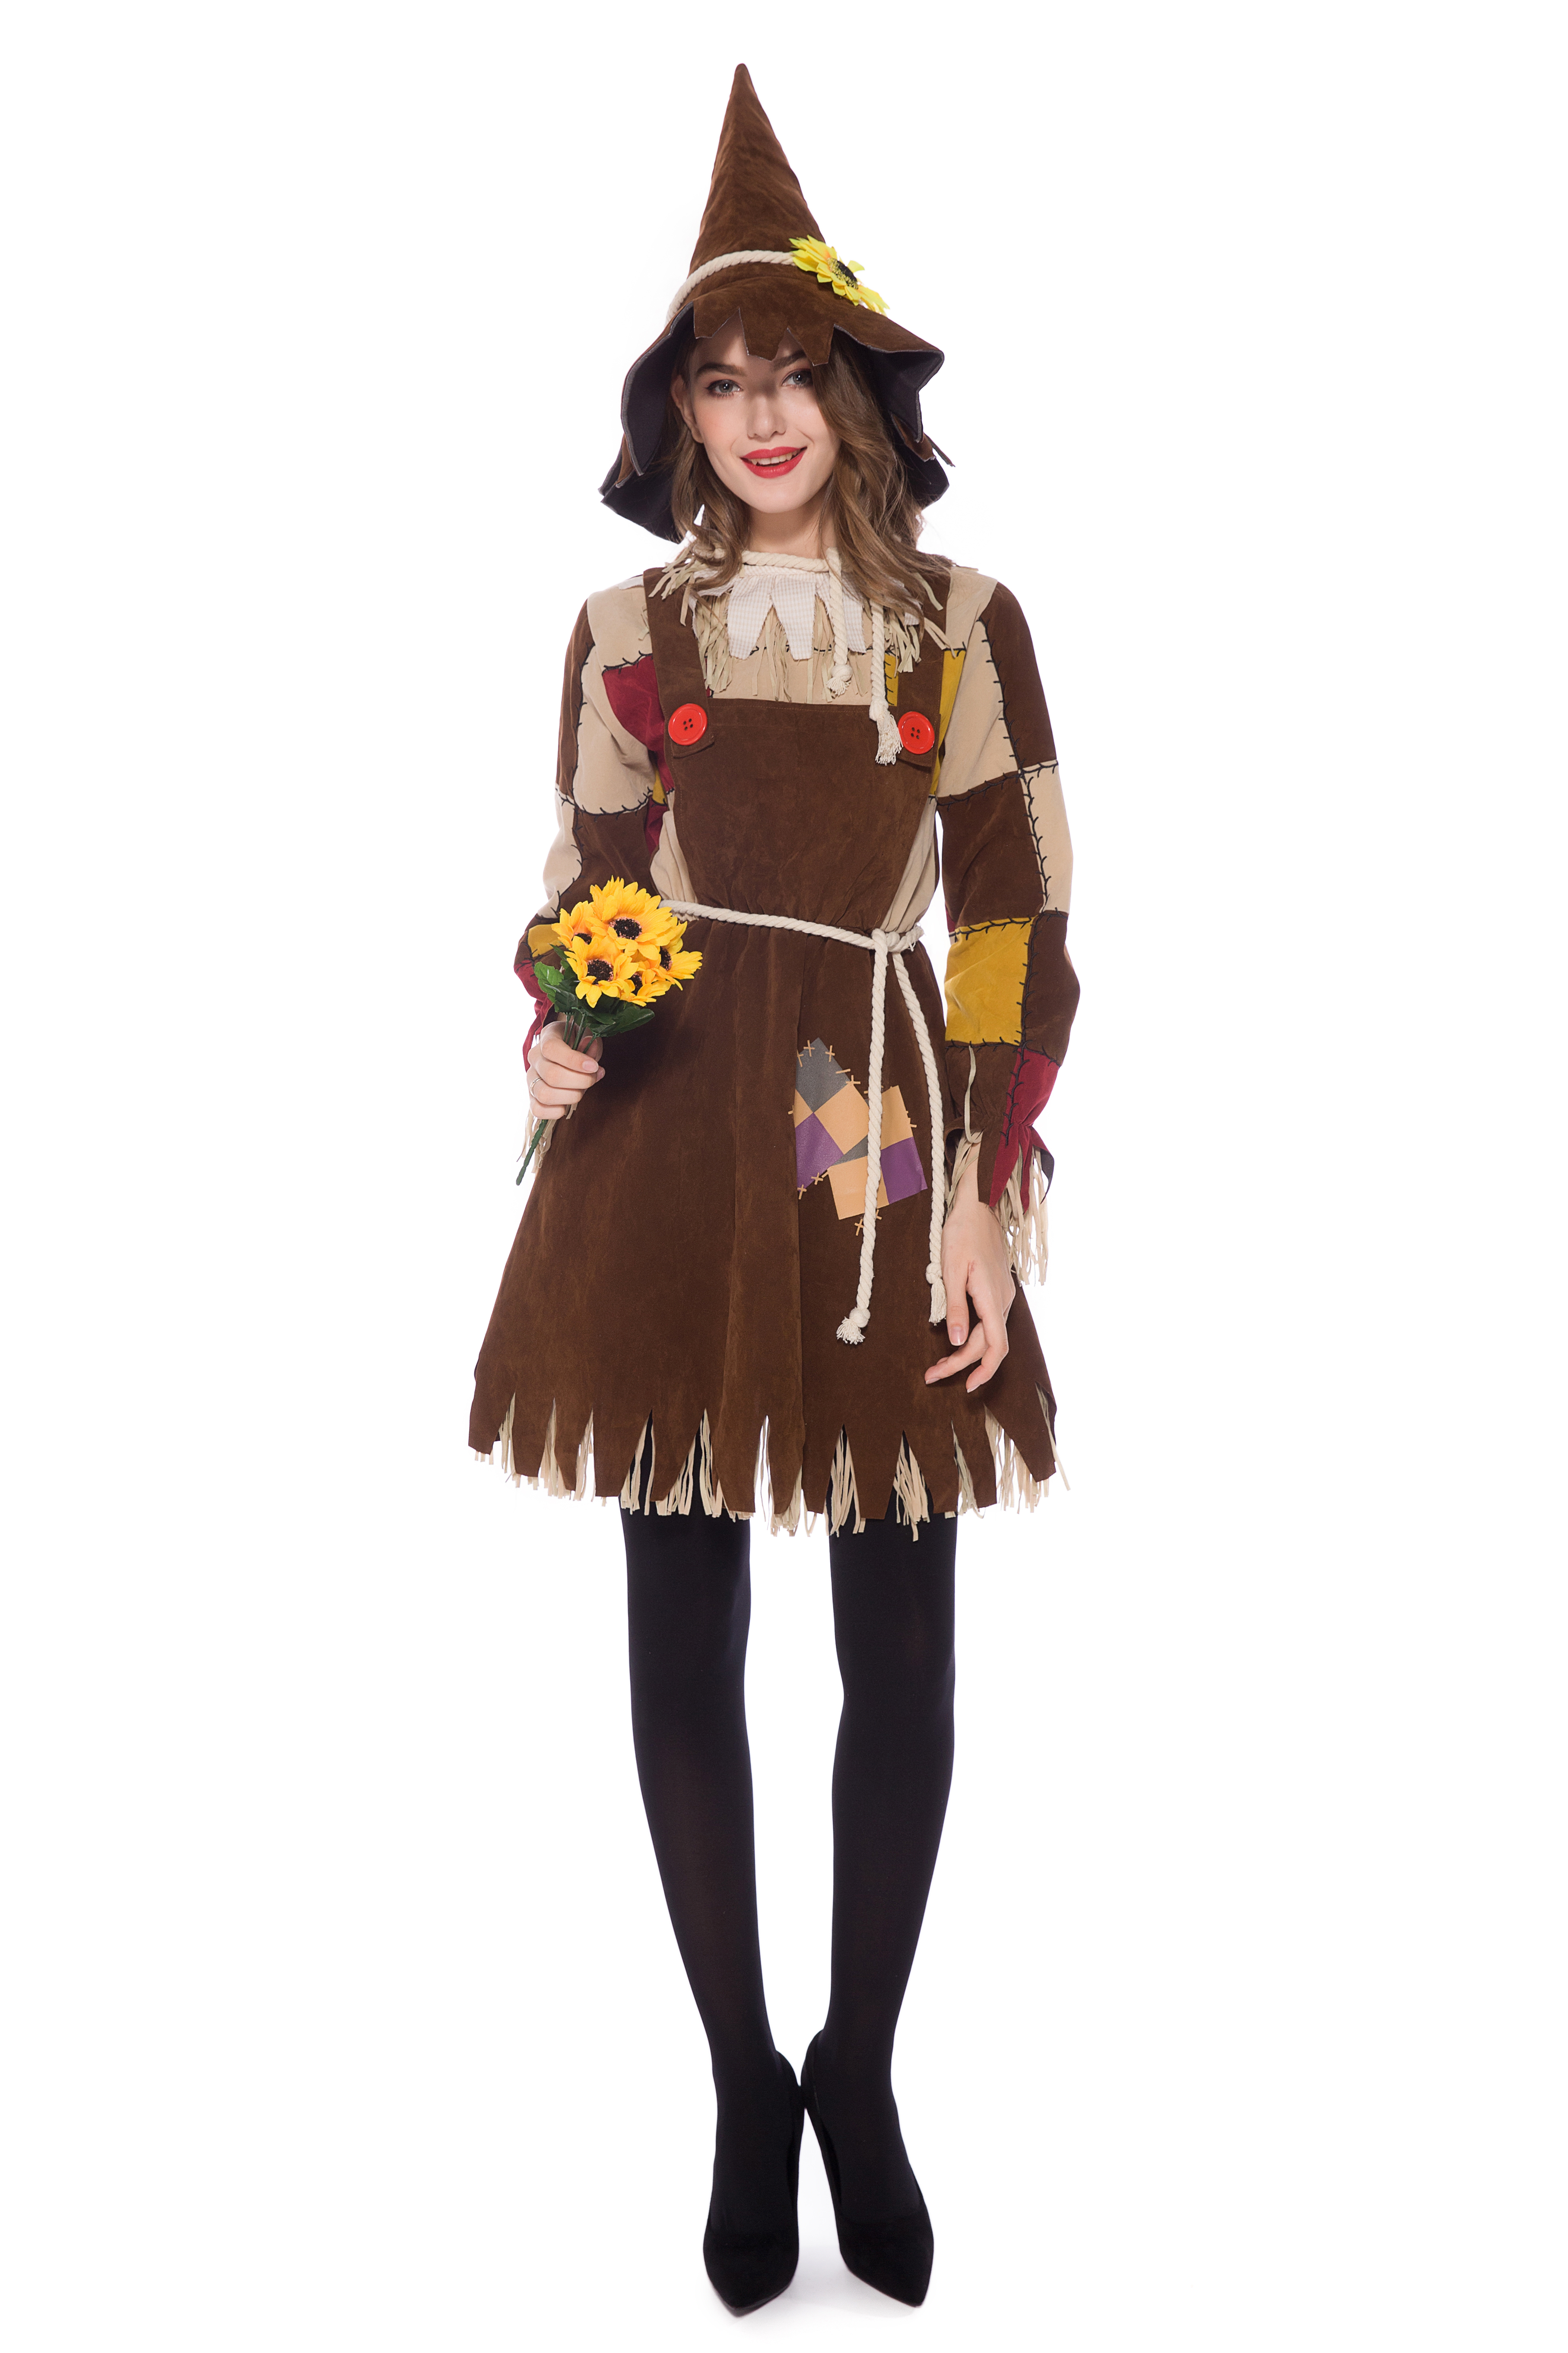 Witch Doctor Waist Cincher Belt Halloween Adults Fancy Dress Accessory